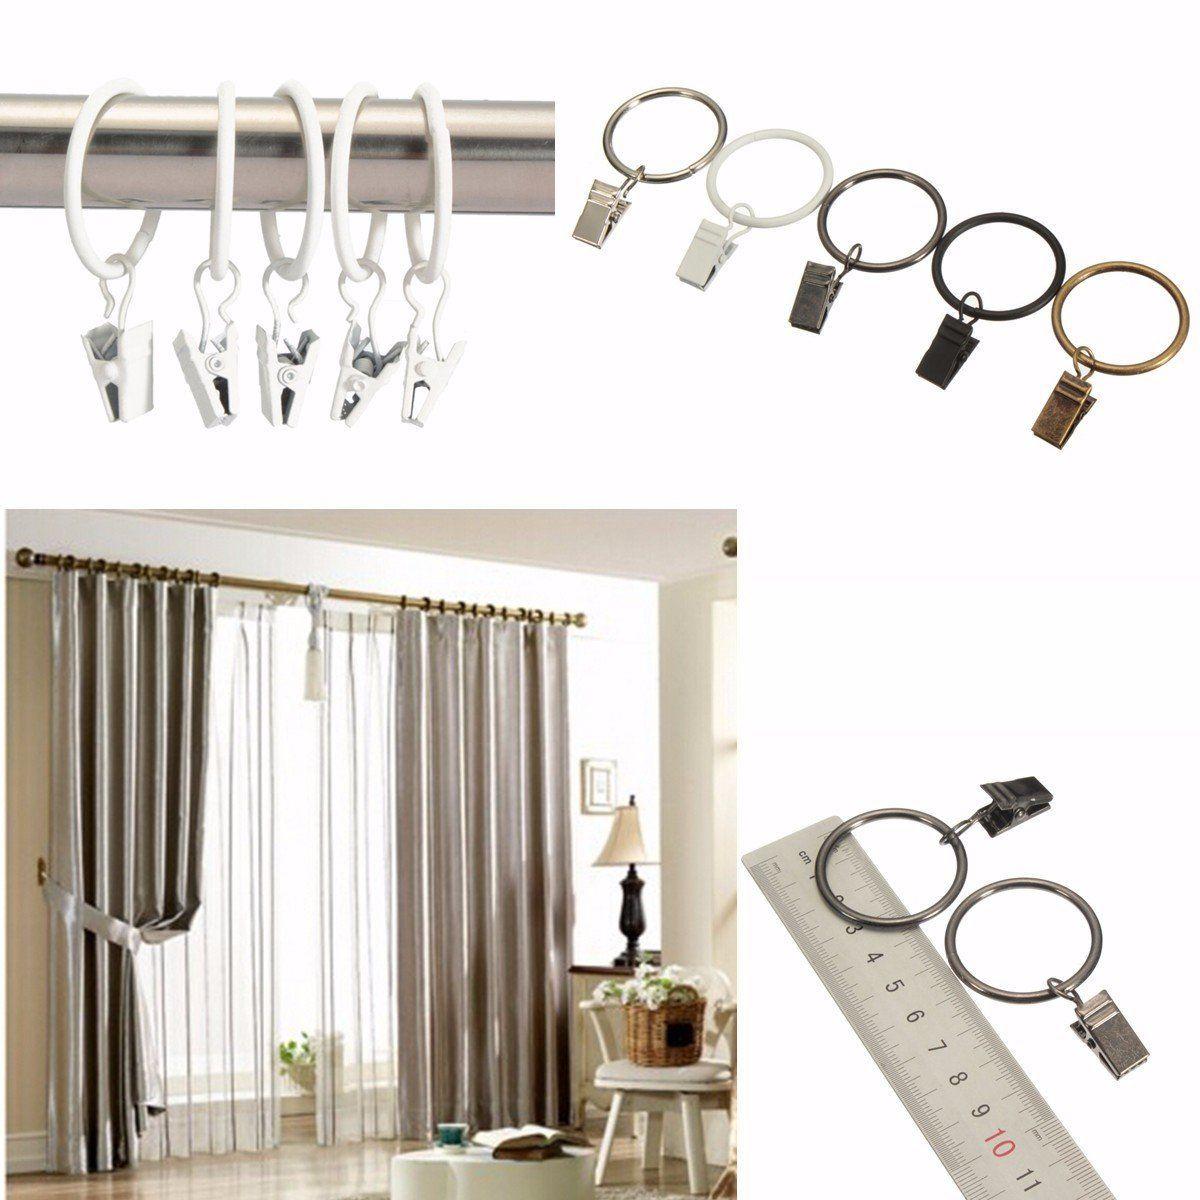 Pcs Metal Window Bathroom Curtain Clips Rings Pole Rod Voile